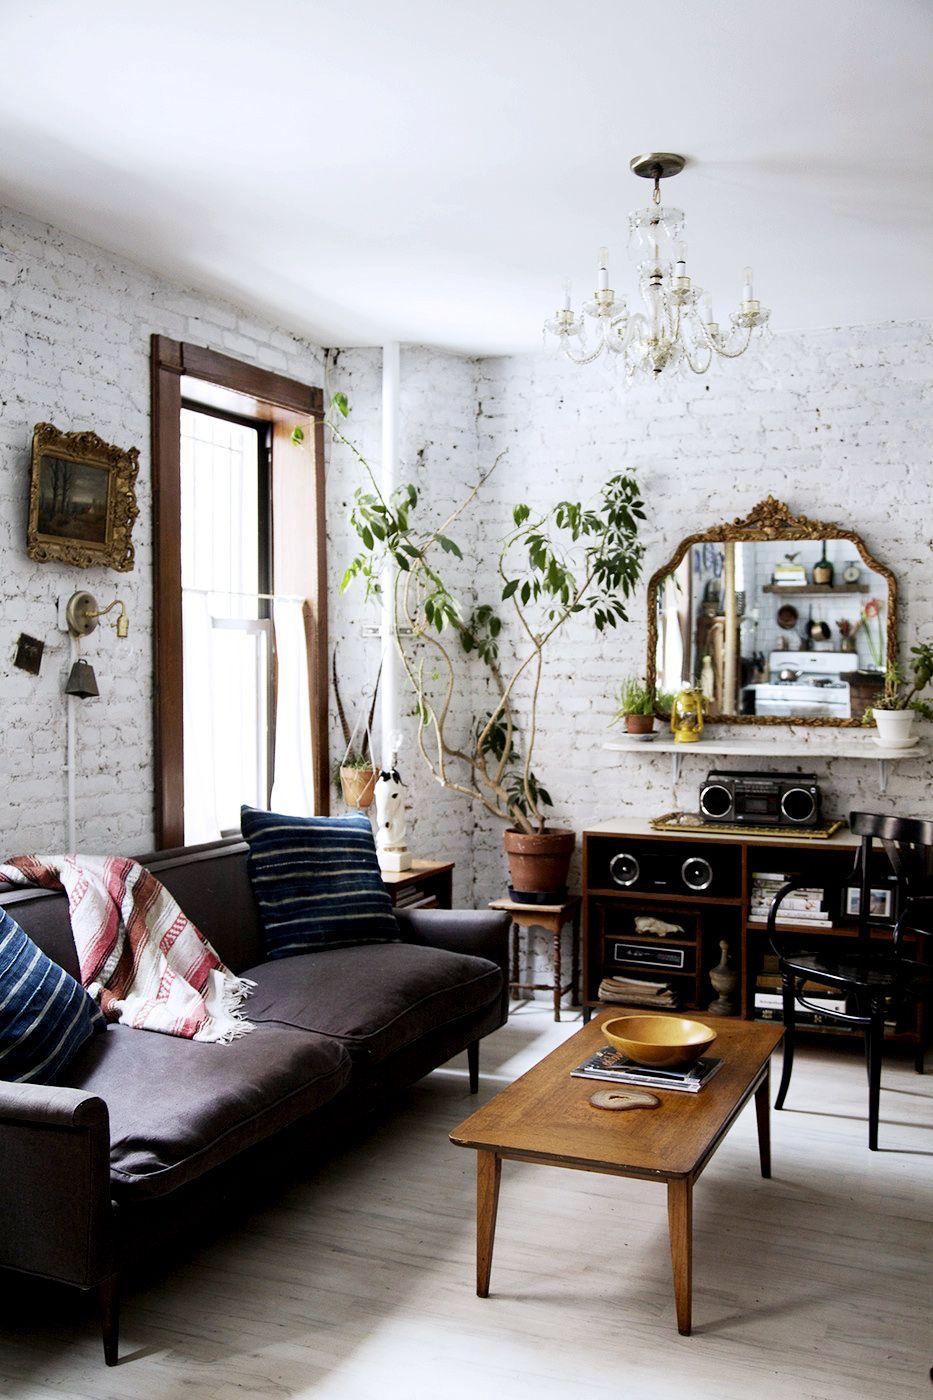 brick living room furniture. t 5apartmentbeforeandaftersyouhavetoseetobelieveviamydomaine